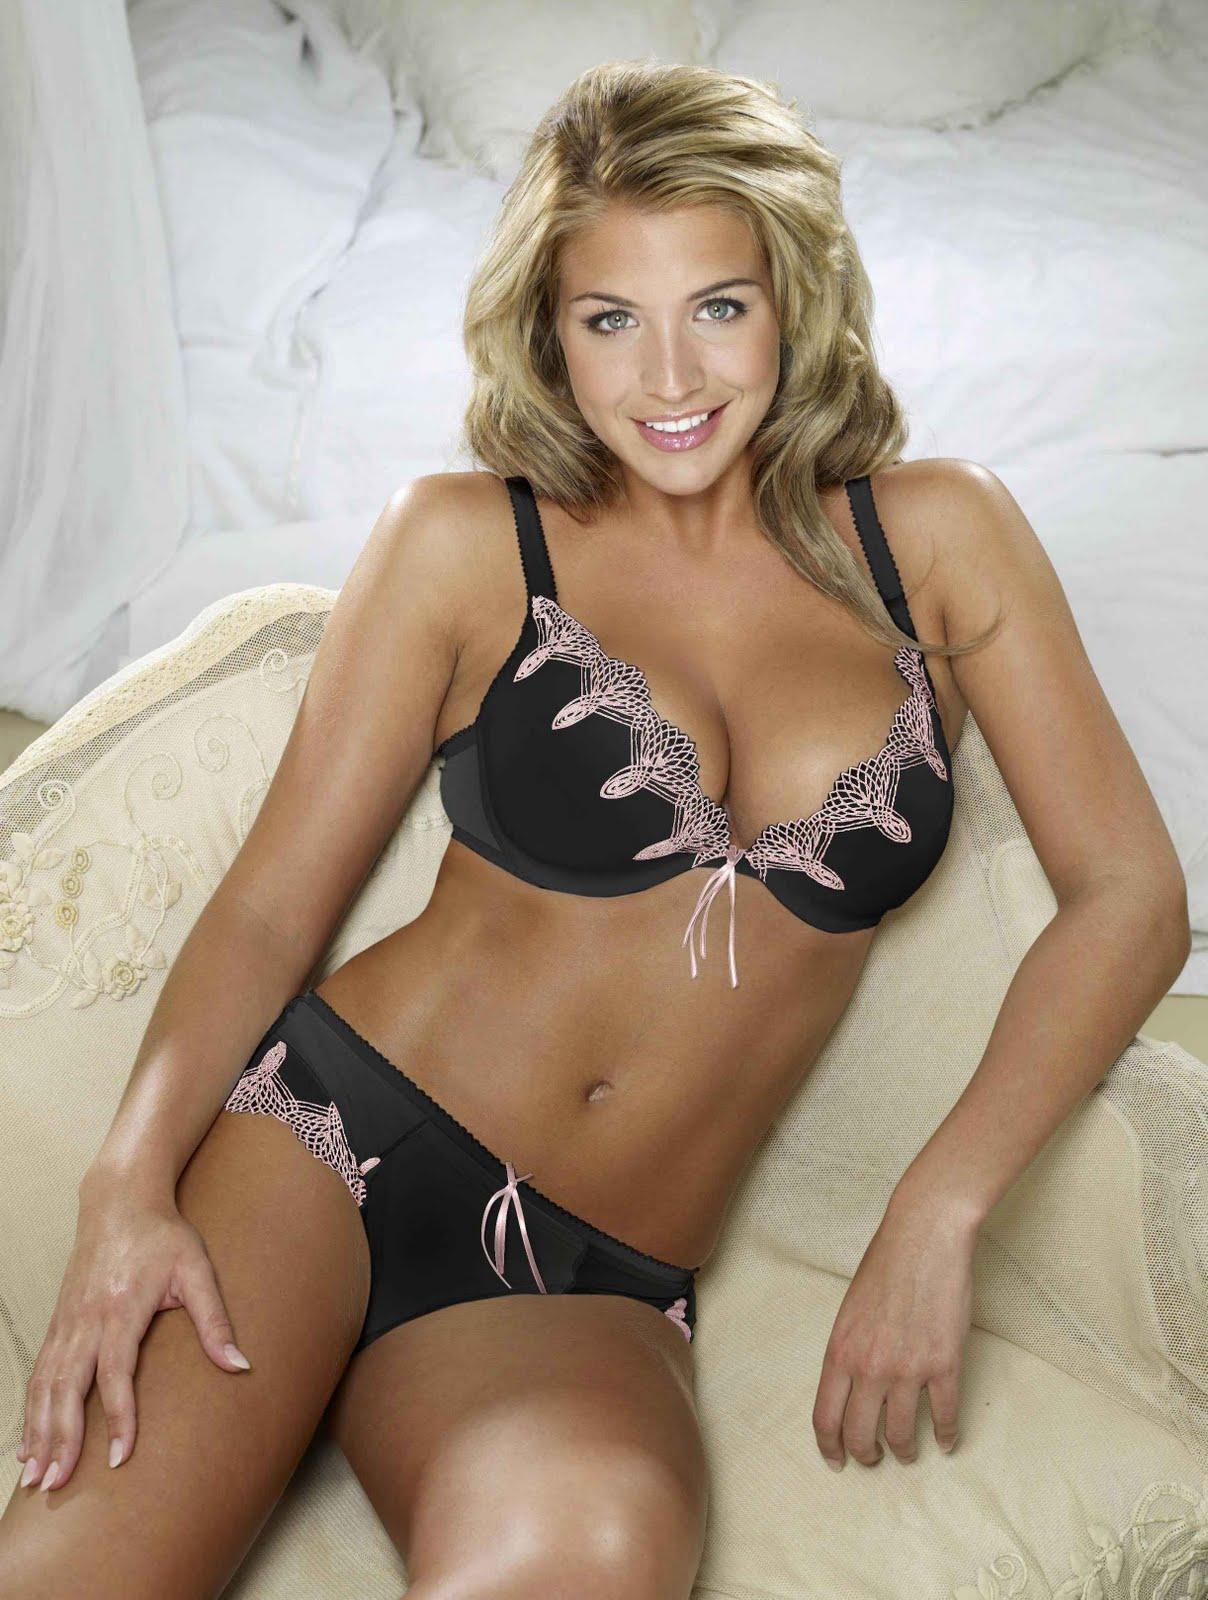 Danielle fishel fake nude pic